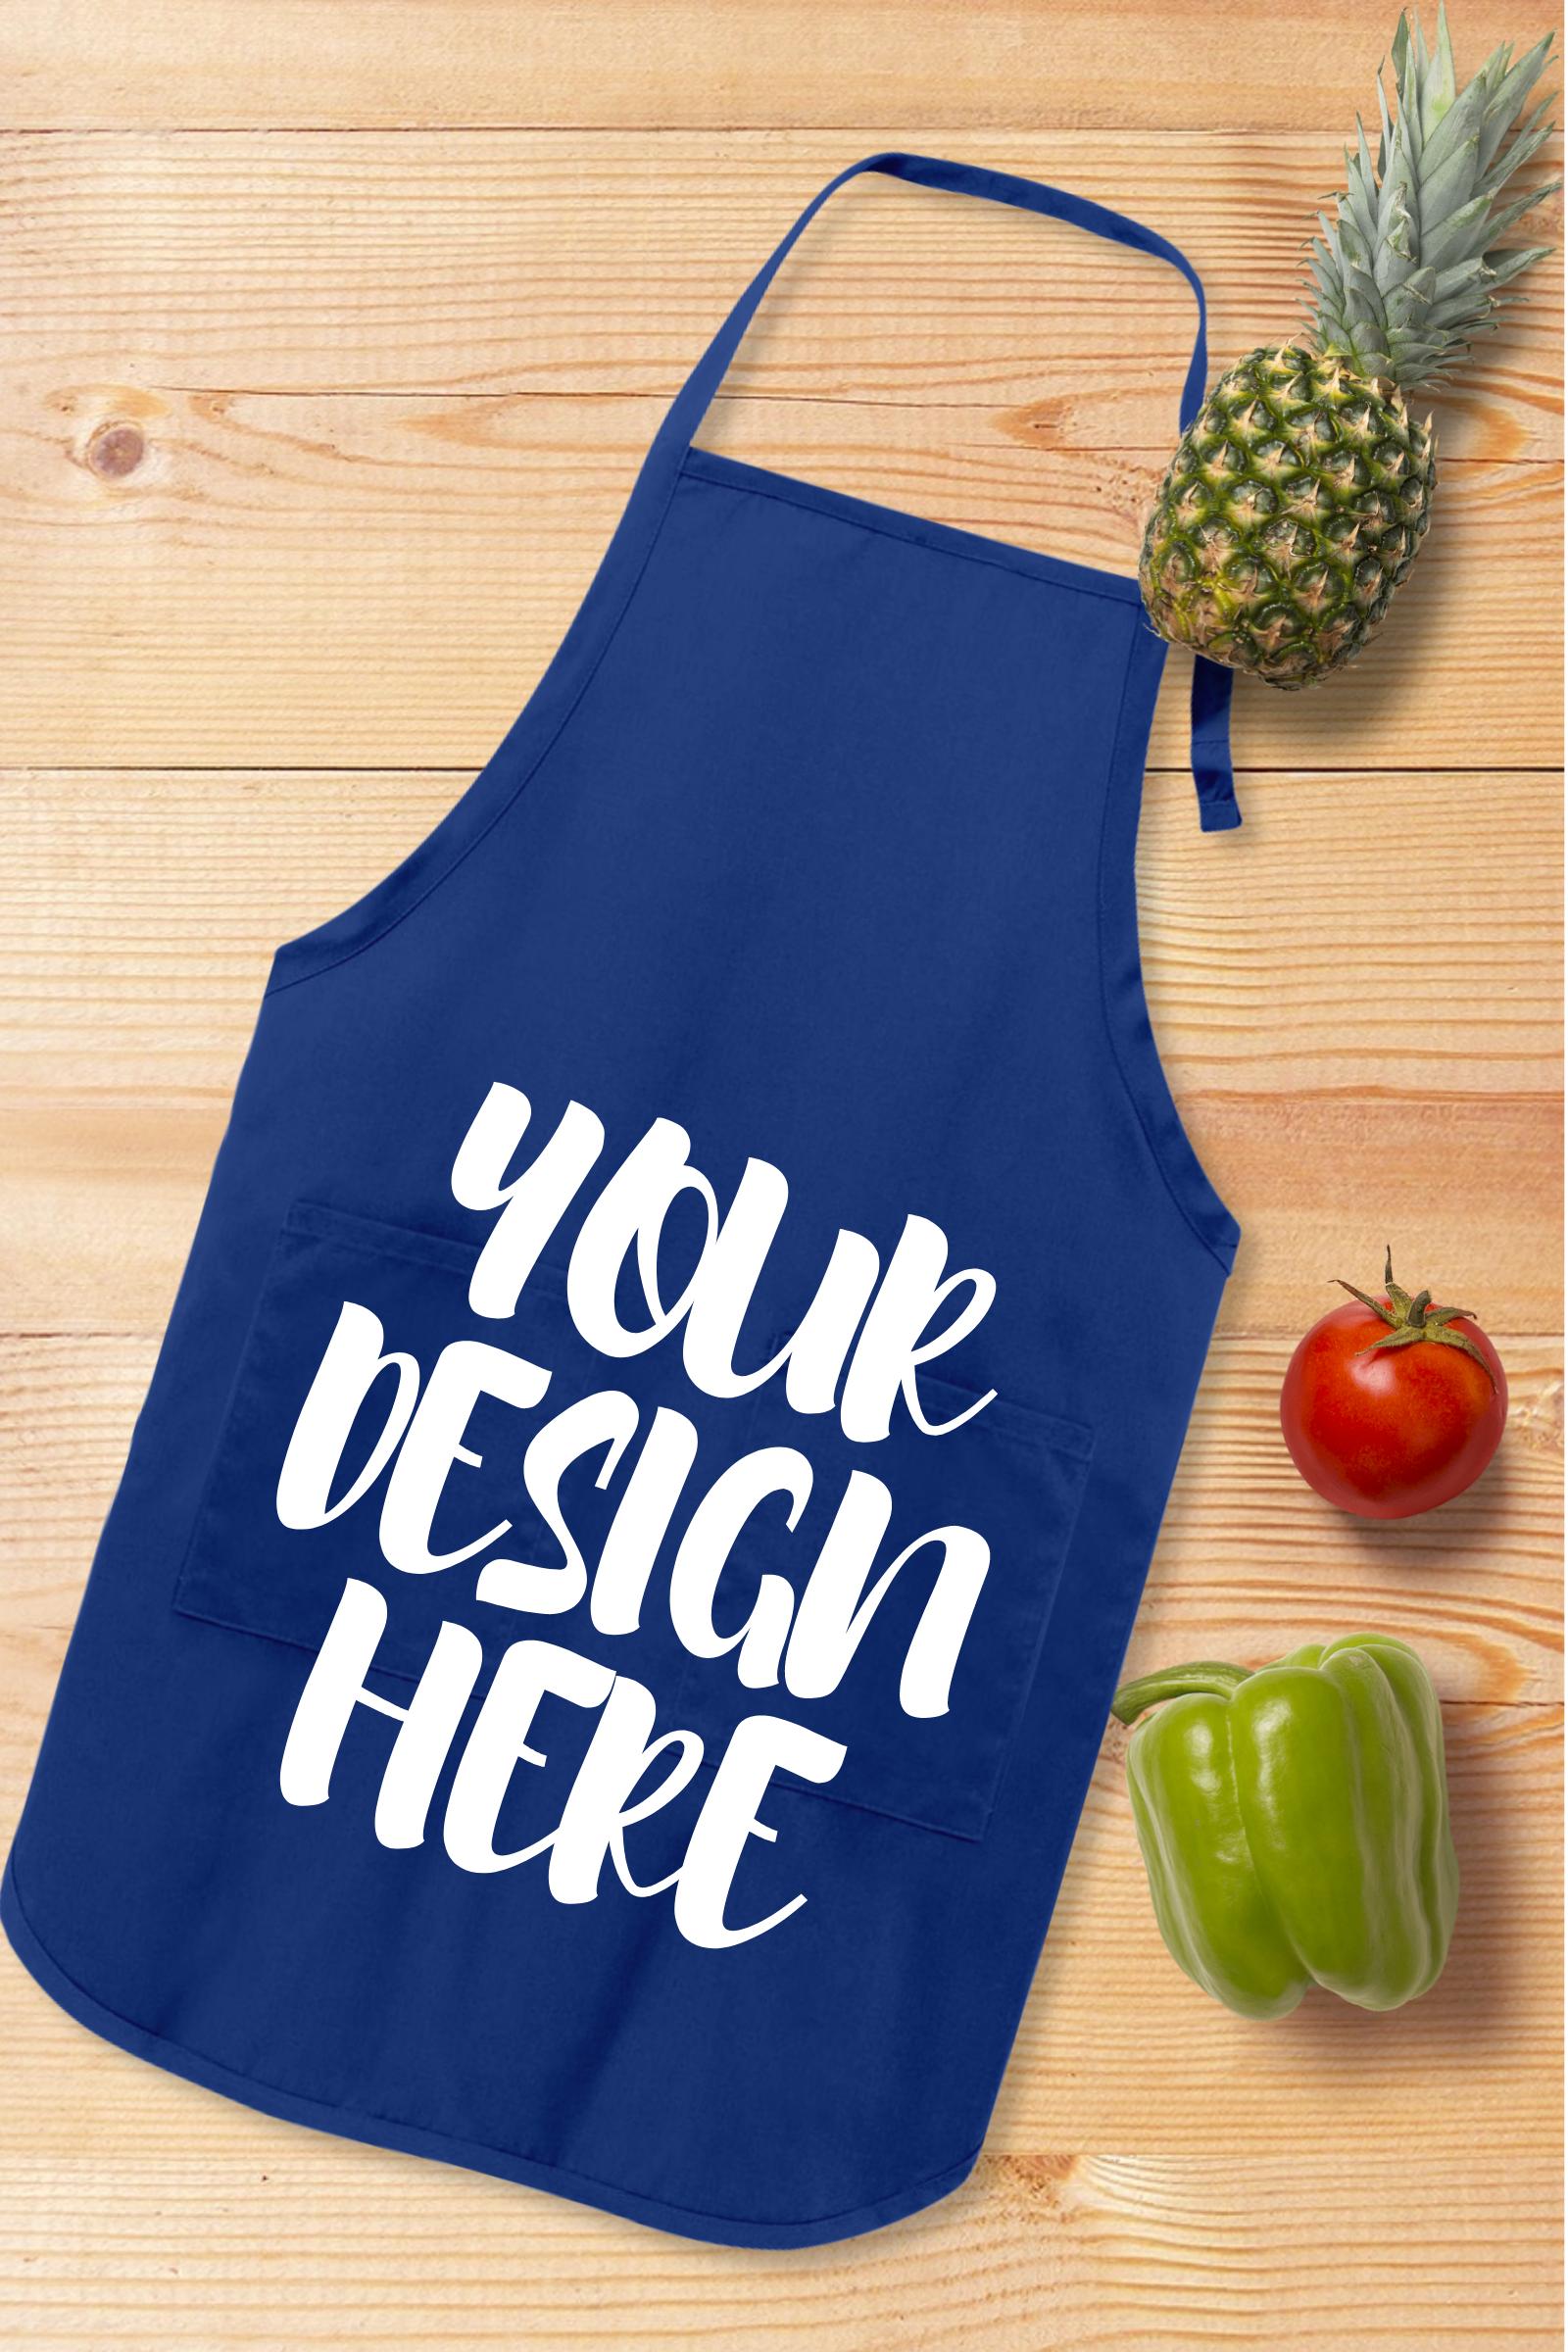 Apron Mock Ups Bundle With Kitchen Theme - 6 example image 2